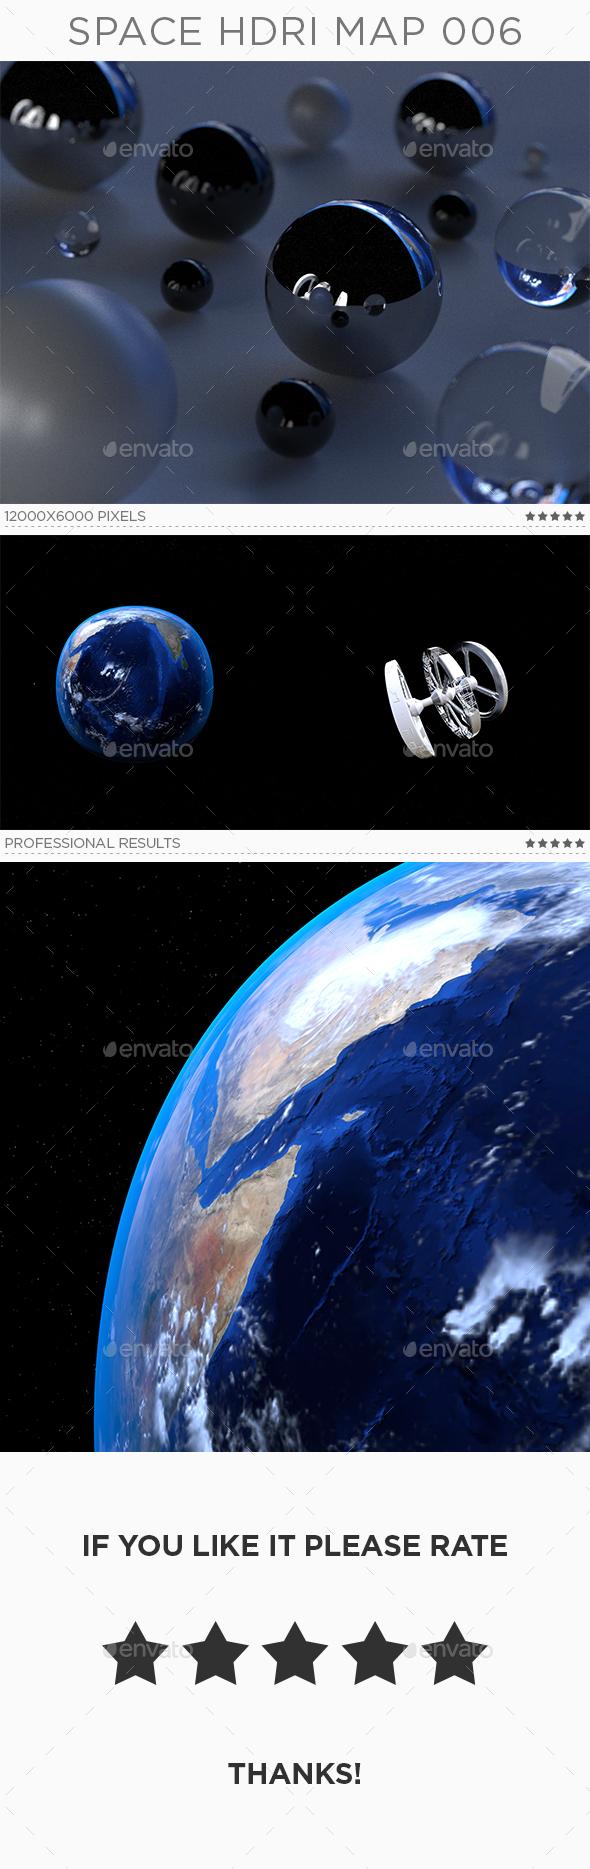 Space HDRi Map 006 - 3DOcean Item for Sale